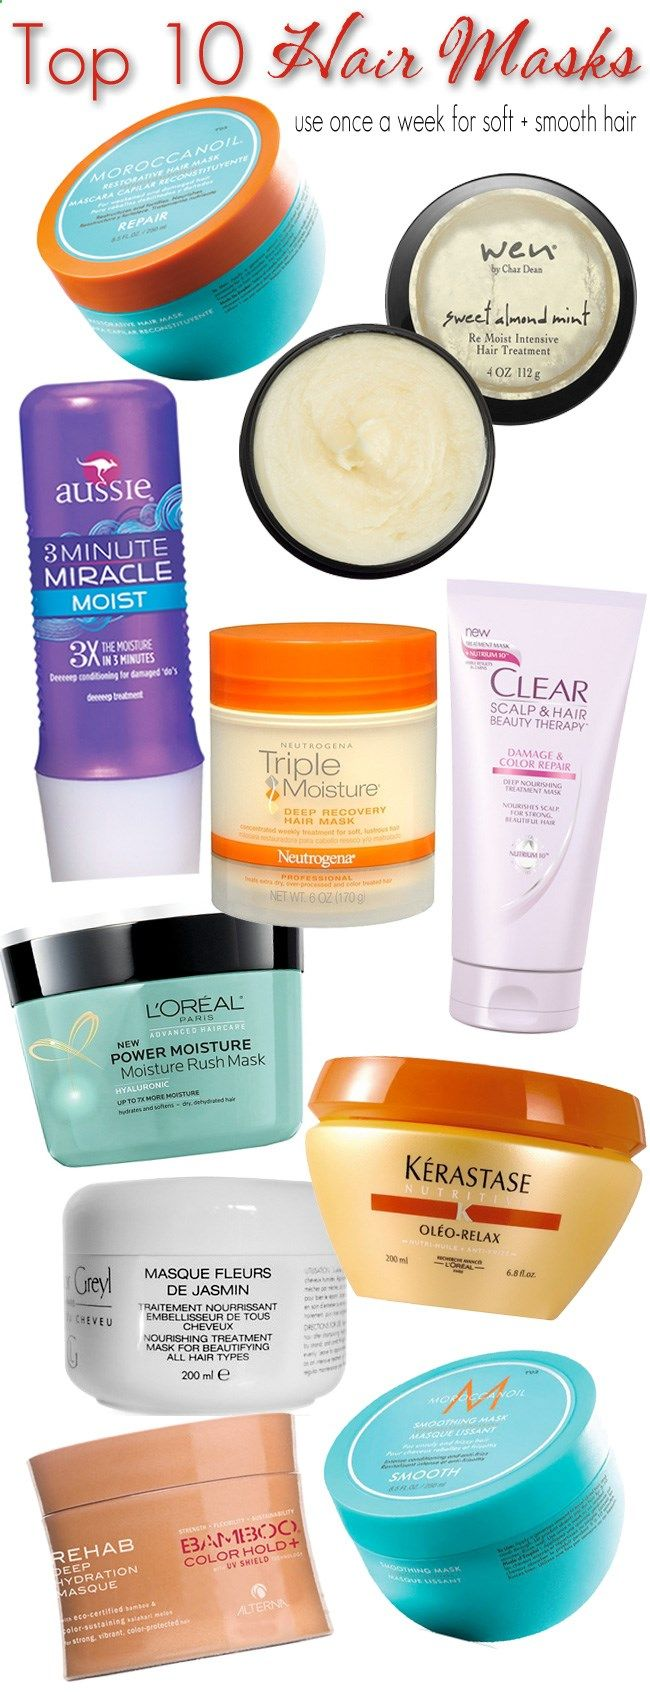 Hair Mask - With everything I put my hair through - coloring, blowdrying, teasing, curling, volumizing, flat i...